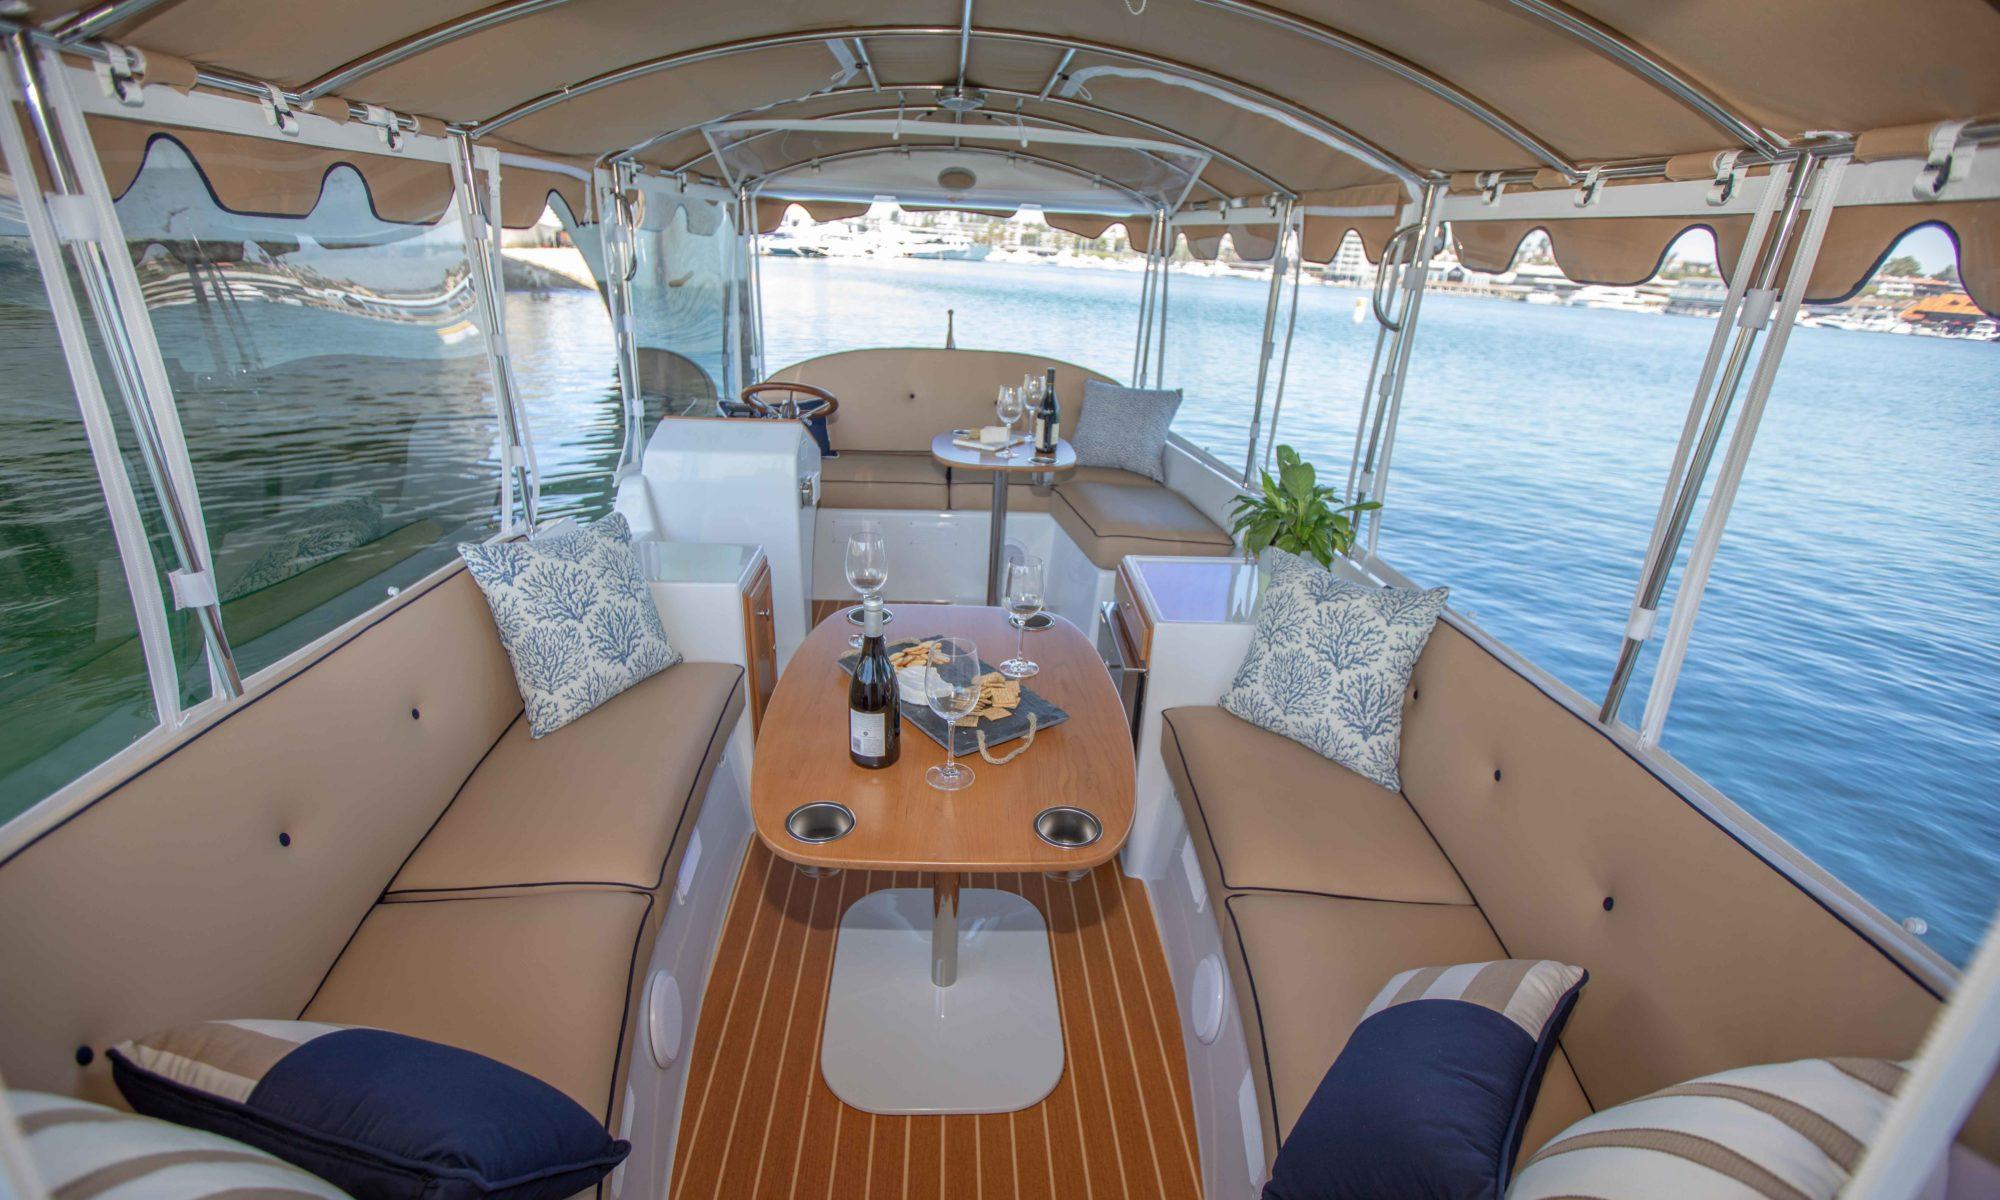 Duffy Electric Boats - 22 Cuddy Cabin